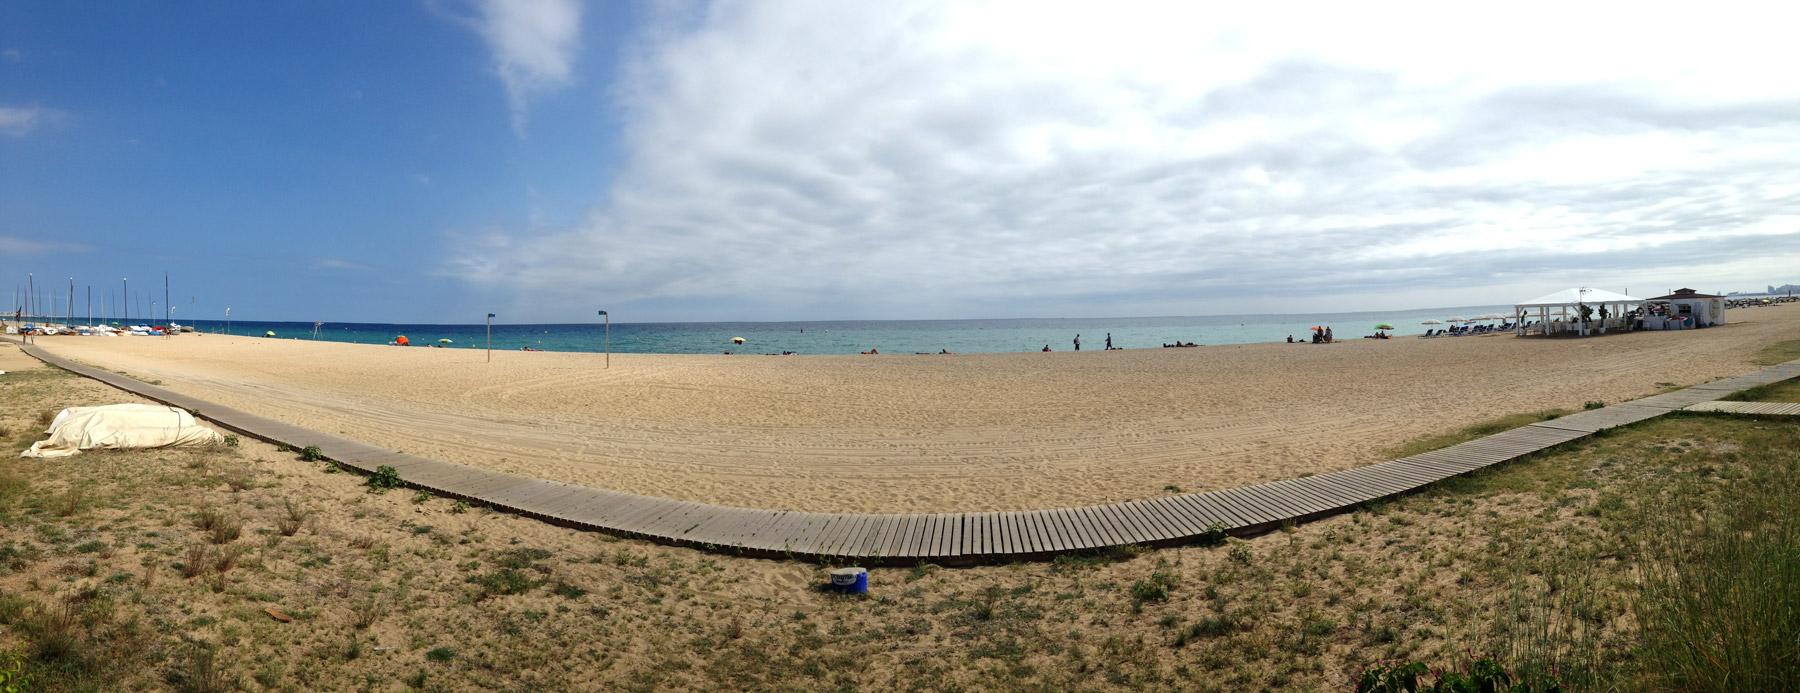 barcelona_mongat_beach